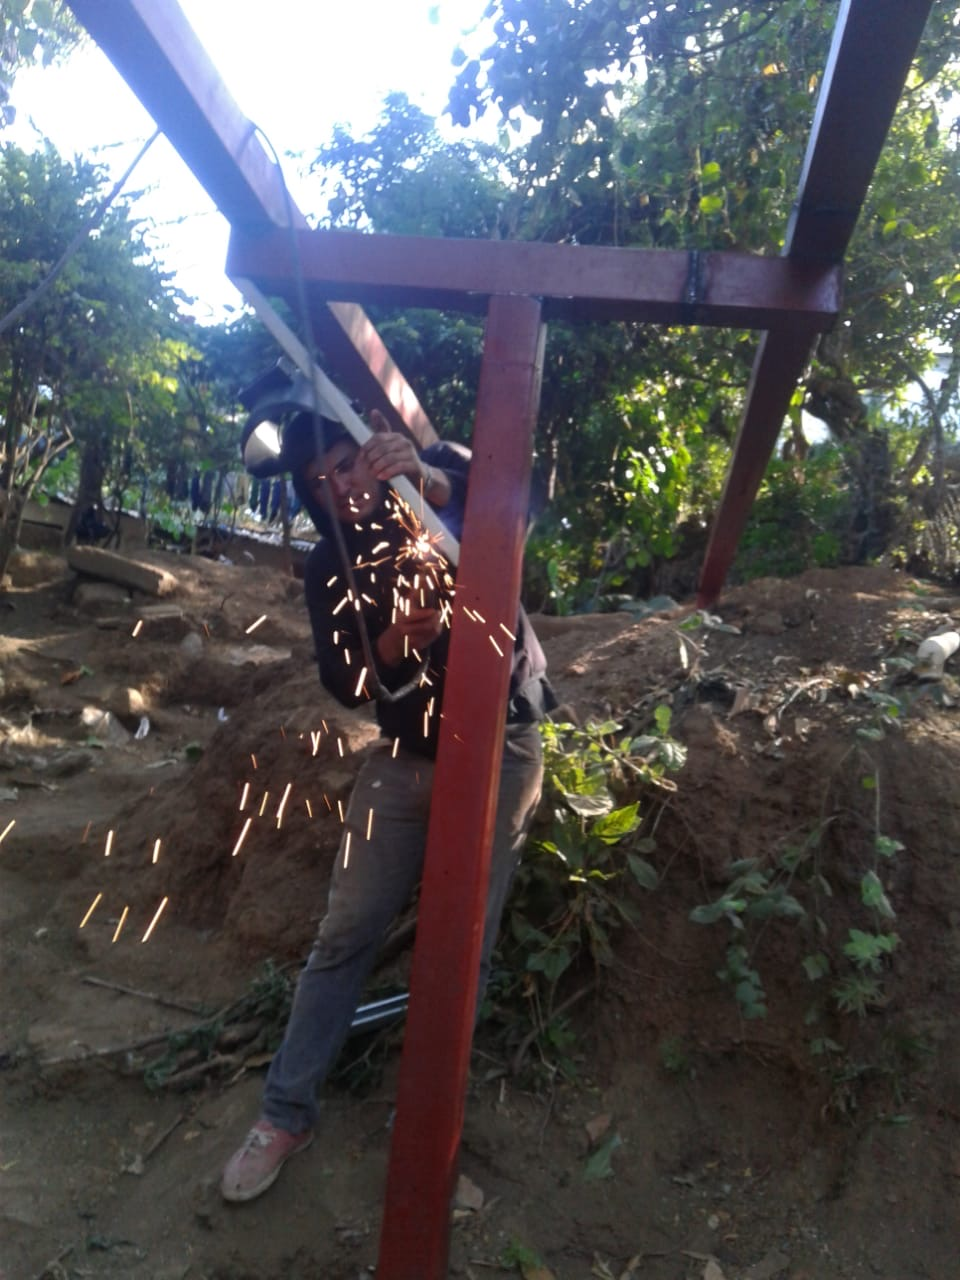 Christ-Journey-Church-a12277a7 df0a 4d87 b30e b1af8885929e 2